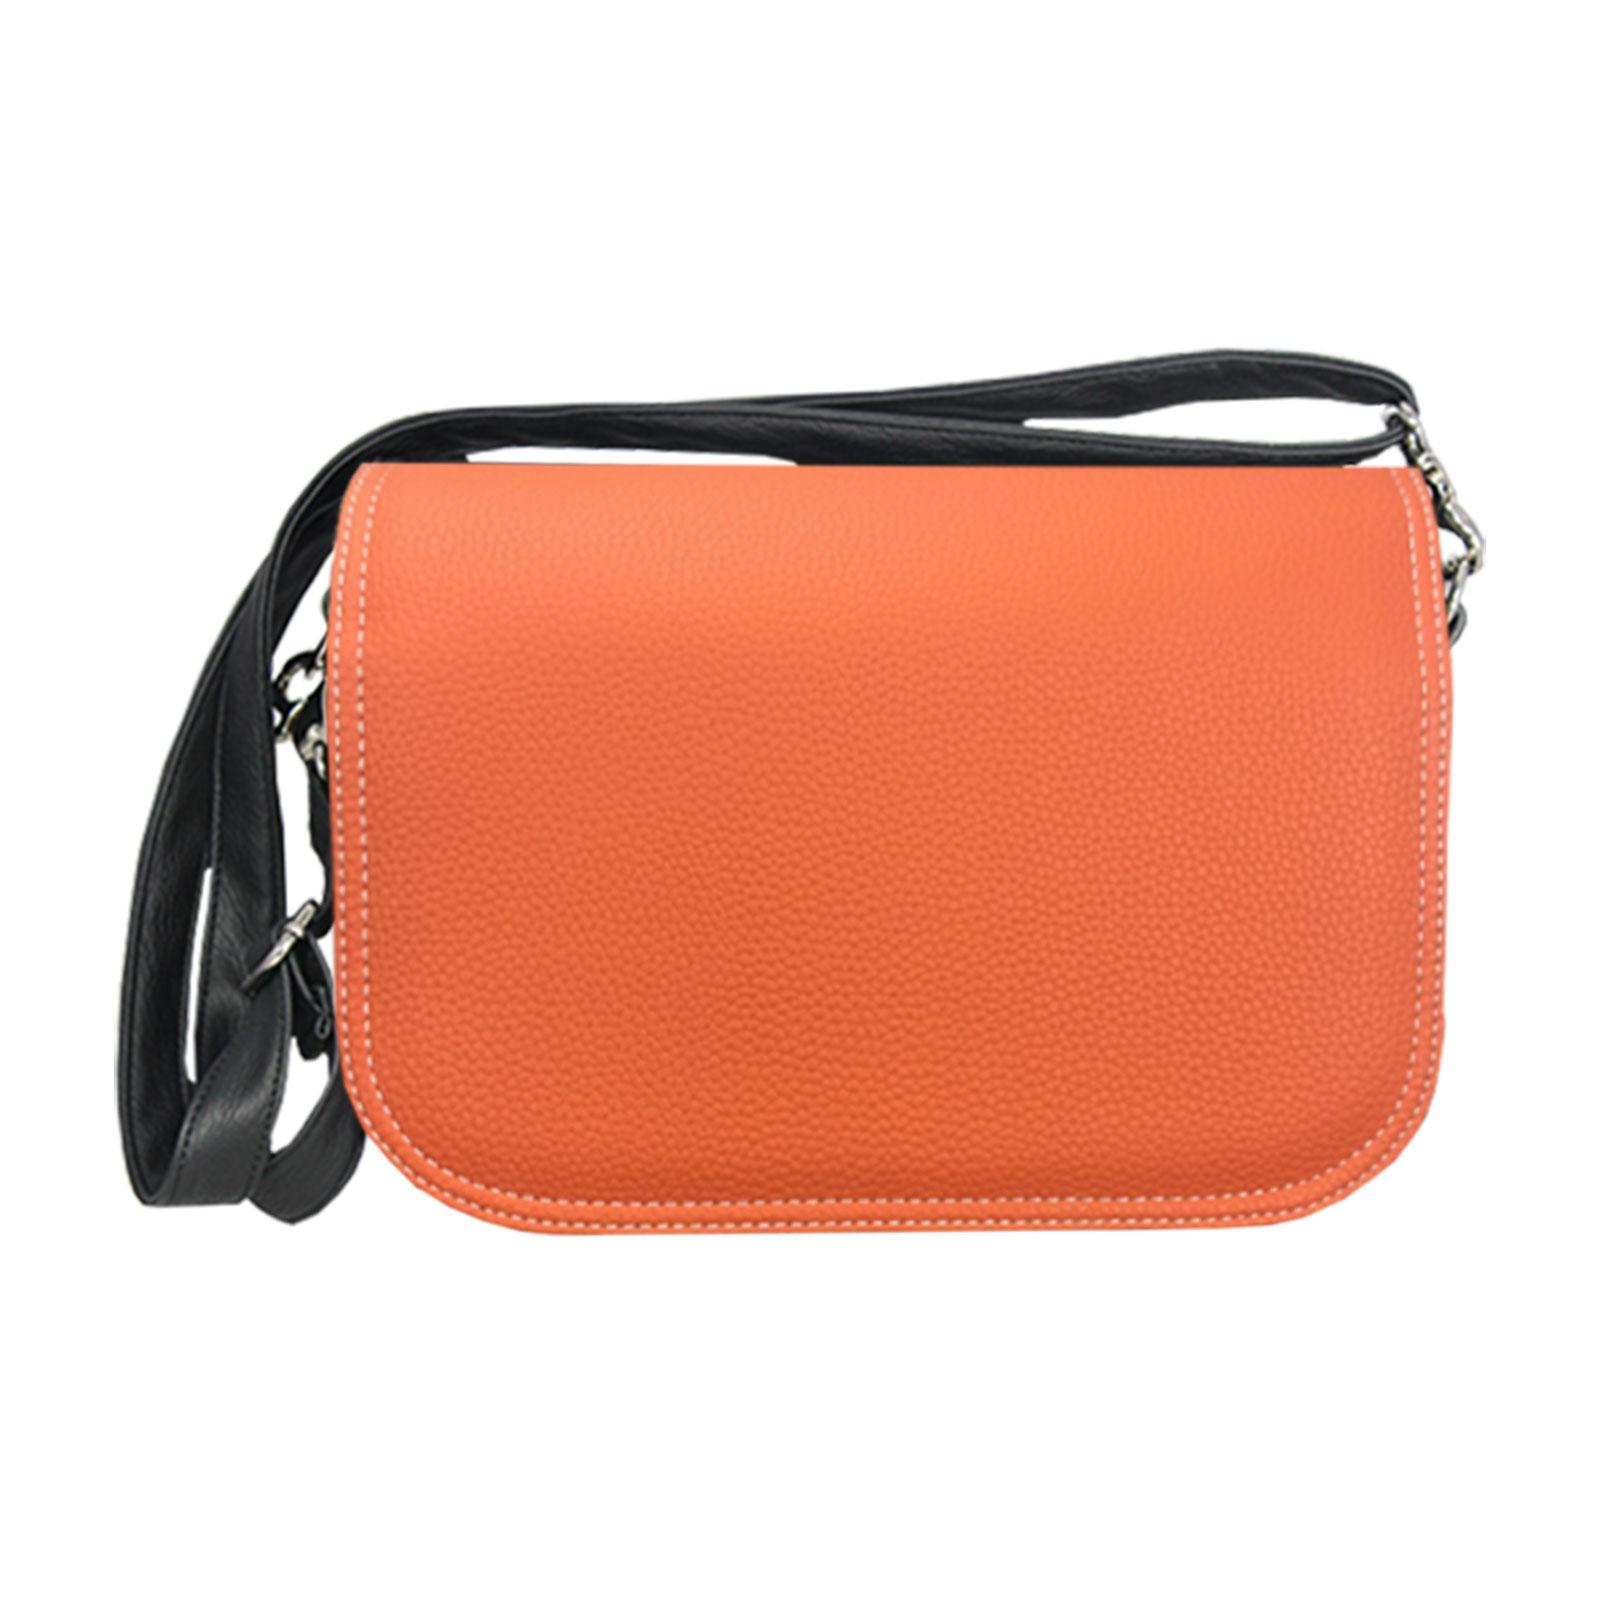 Orangefarbende Cross Over Tasche im Set Preis